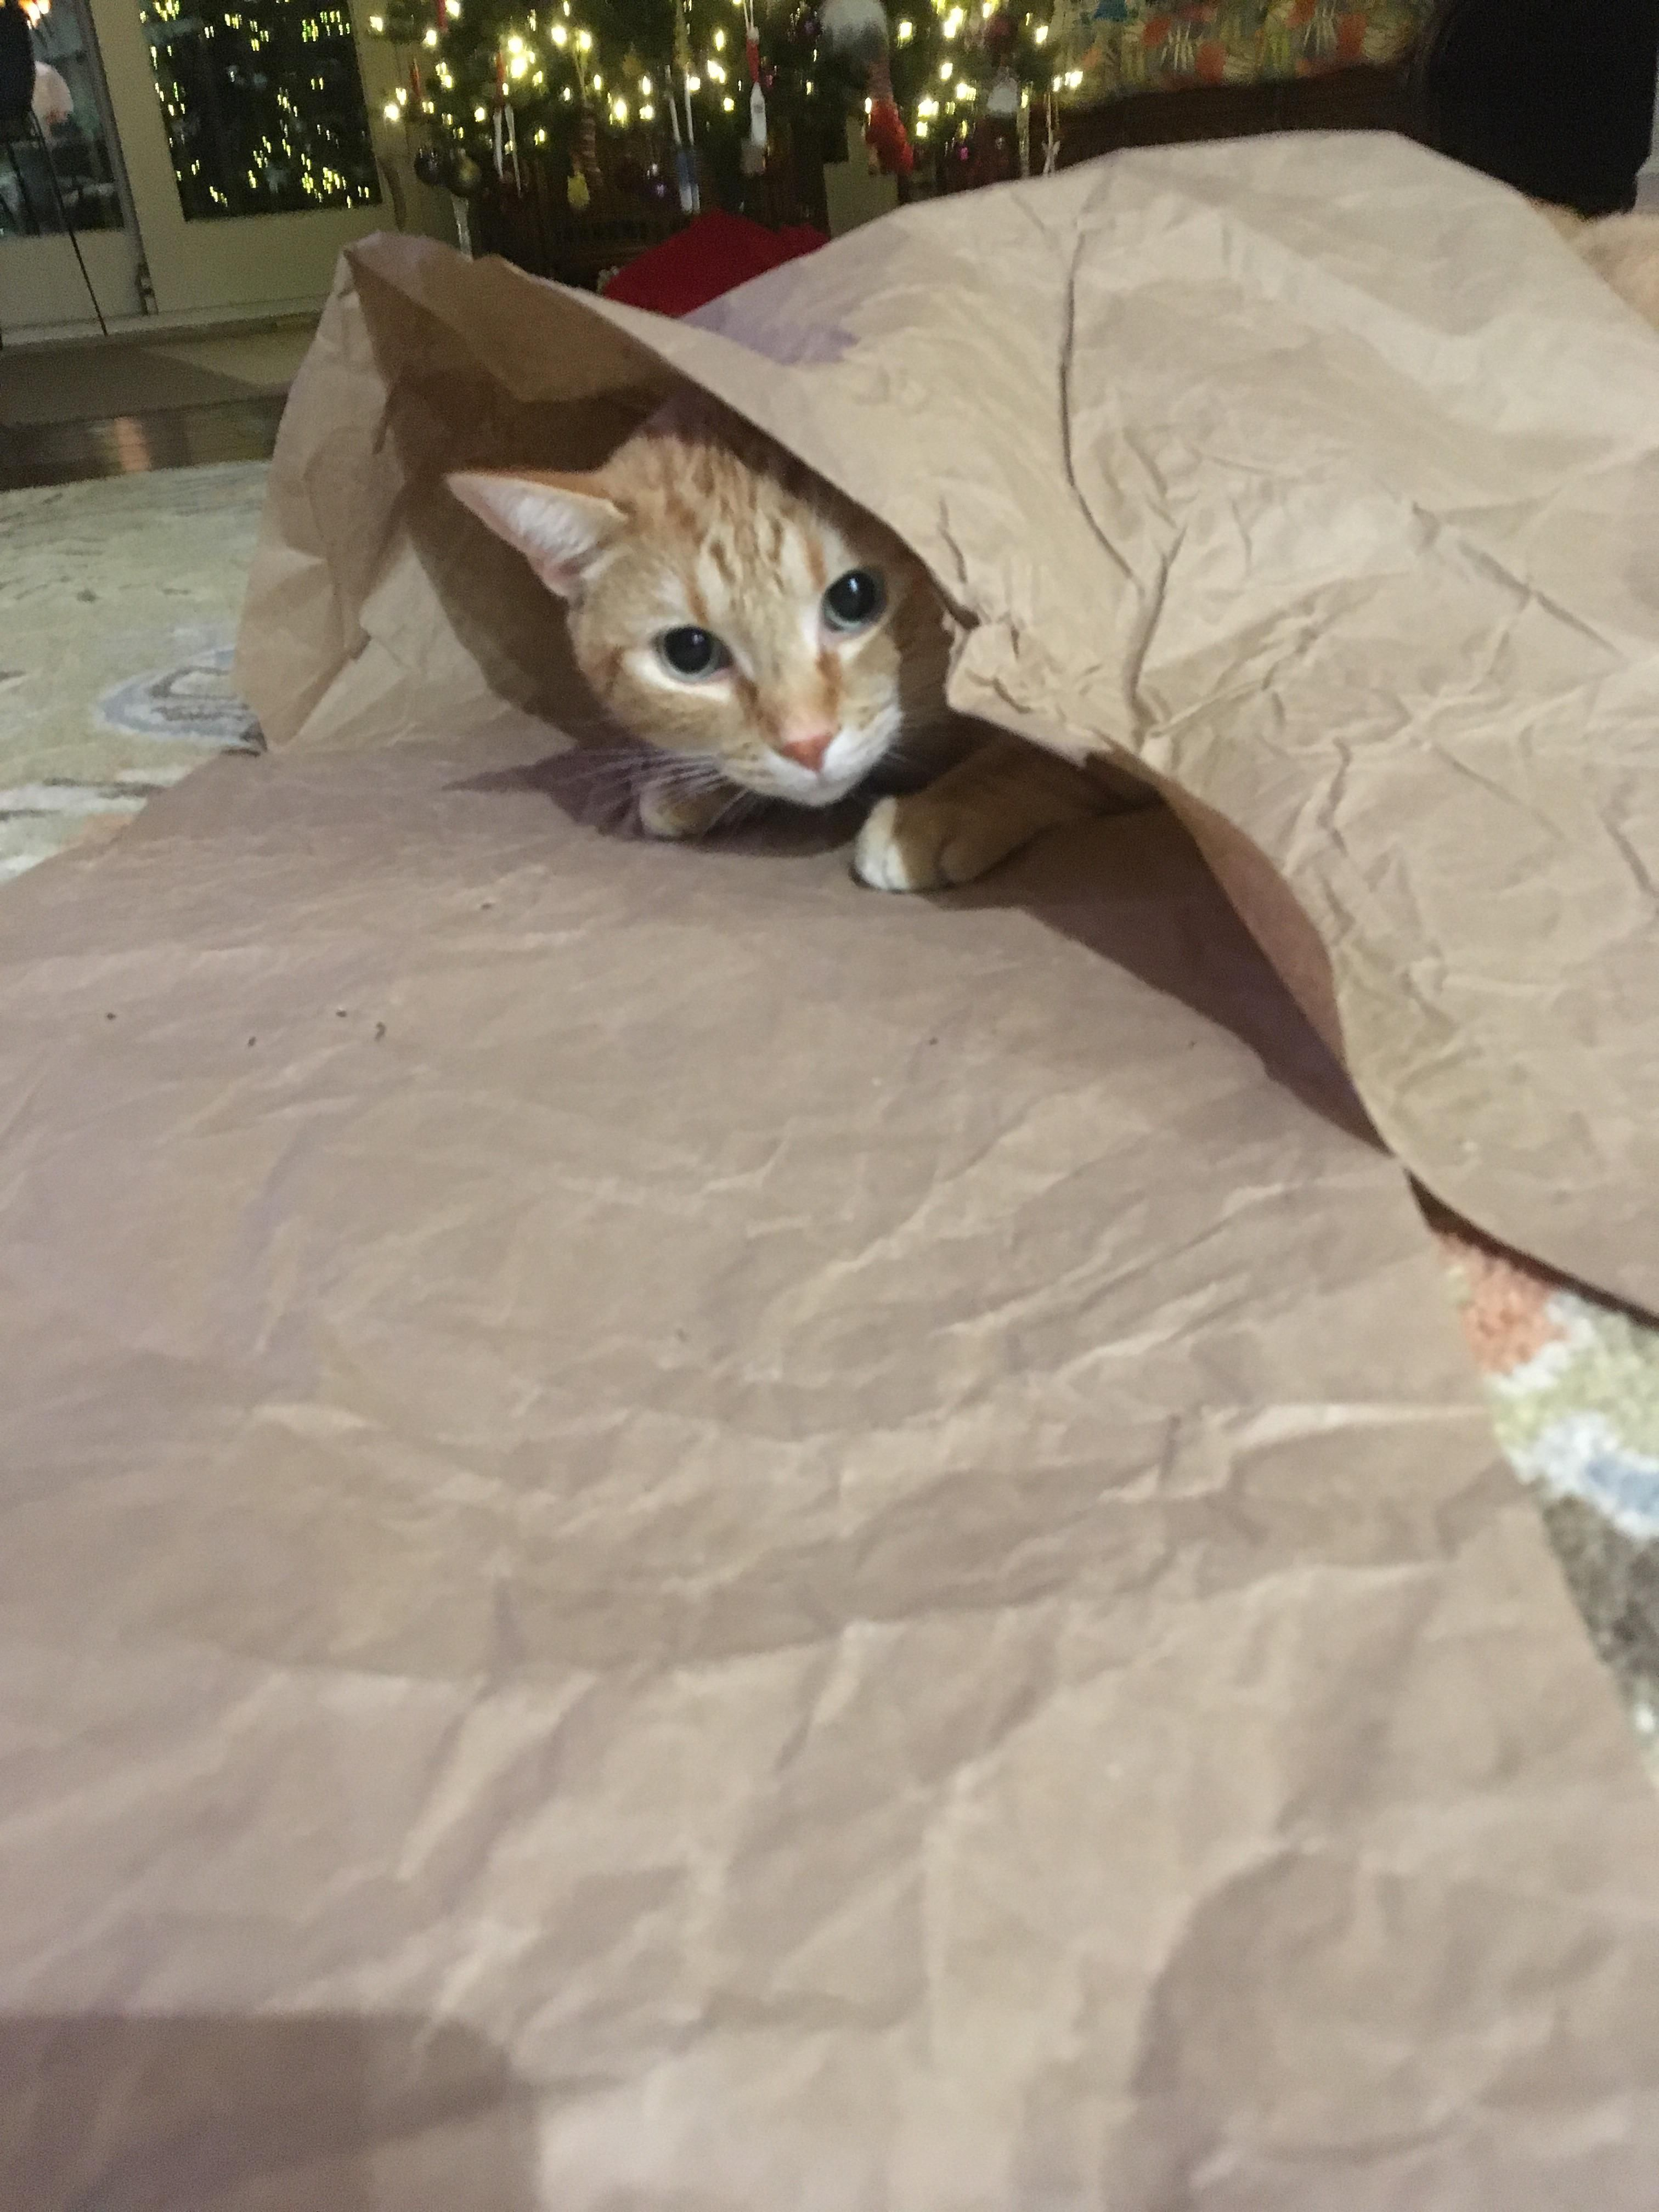 Someone Got A New Bag Today Cat Having Kittens Cat Fleas Cat Hug